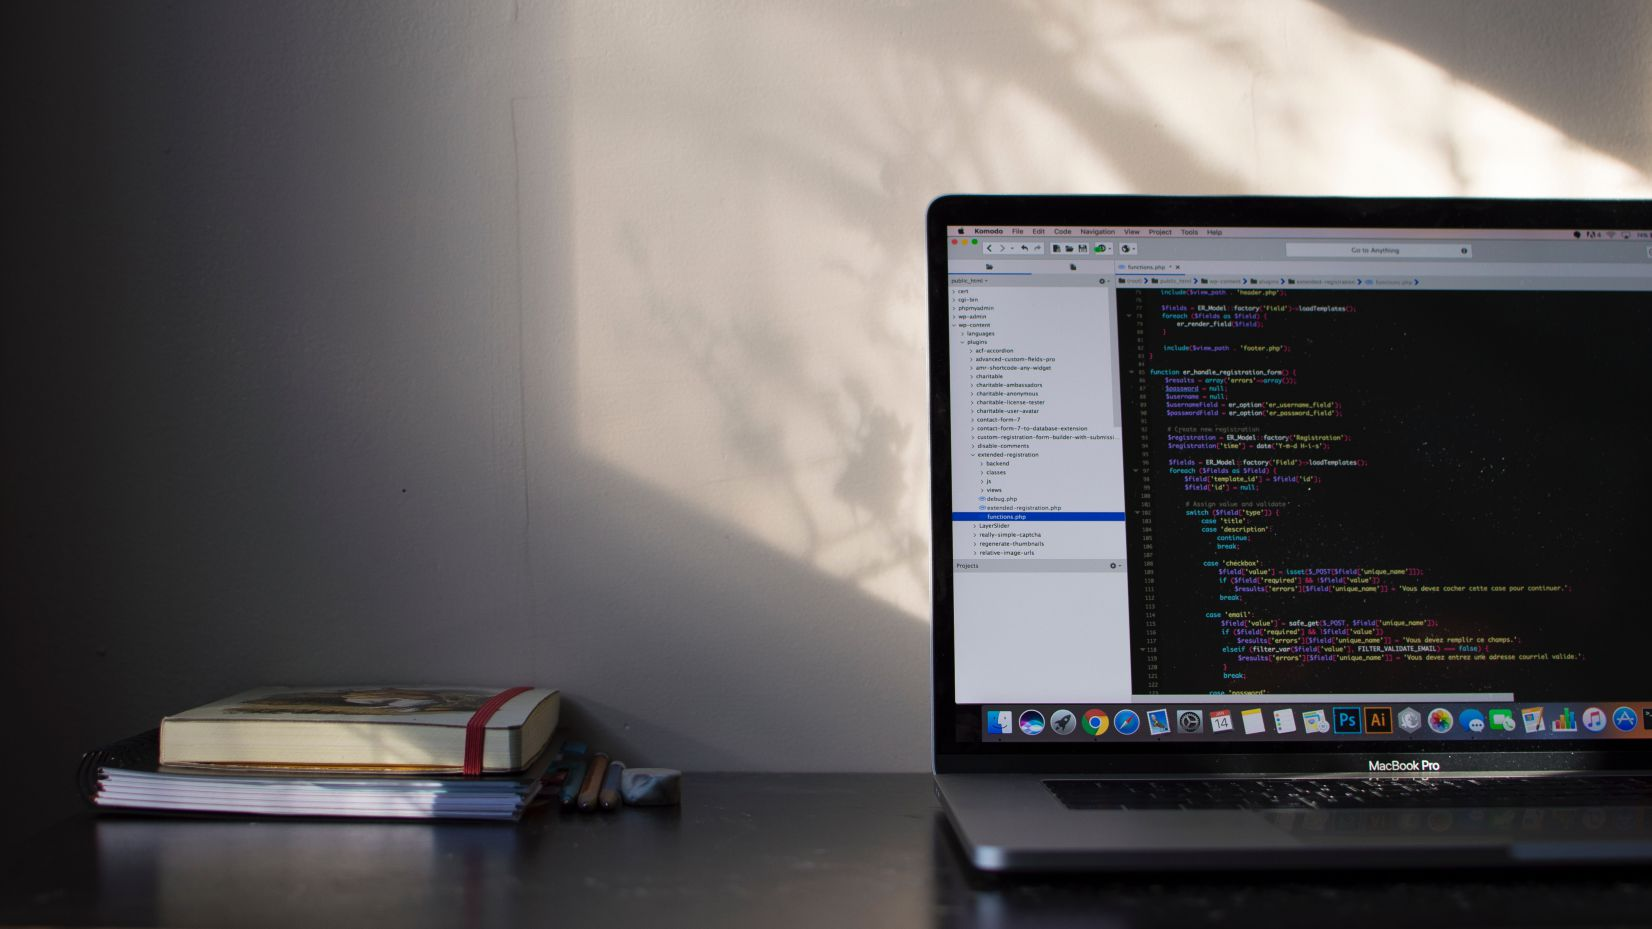 kỹ năng cần có của web developer